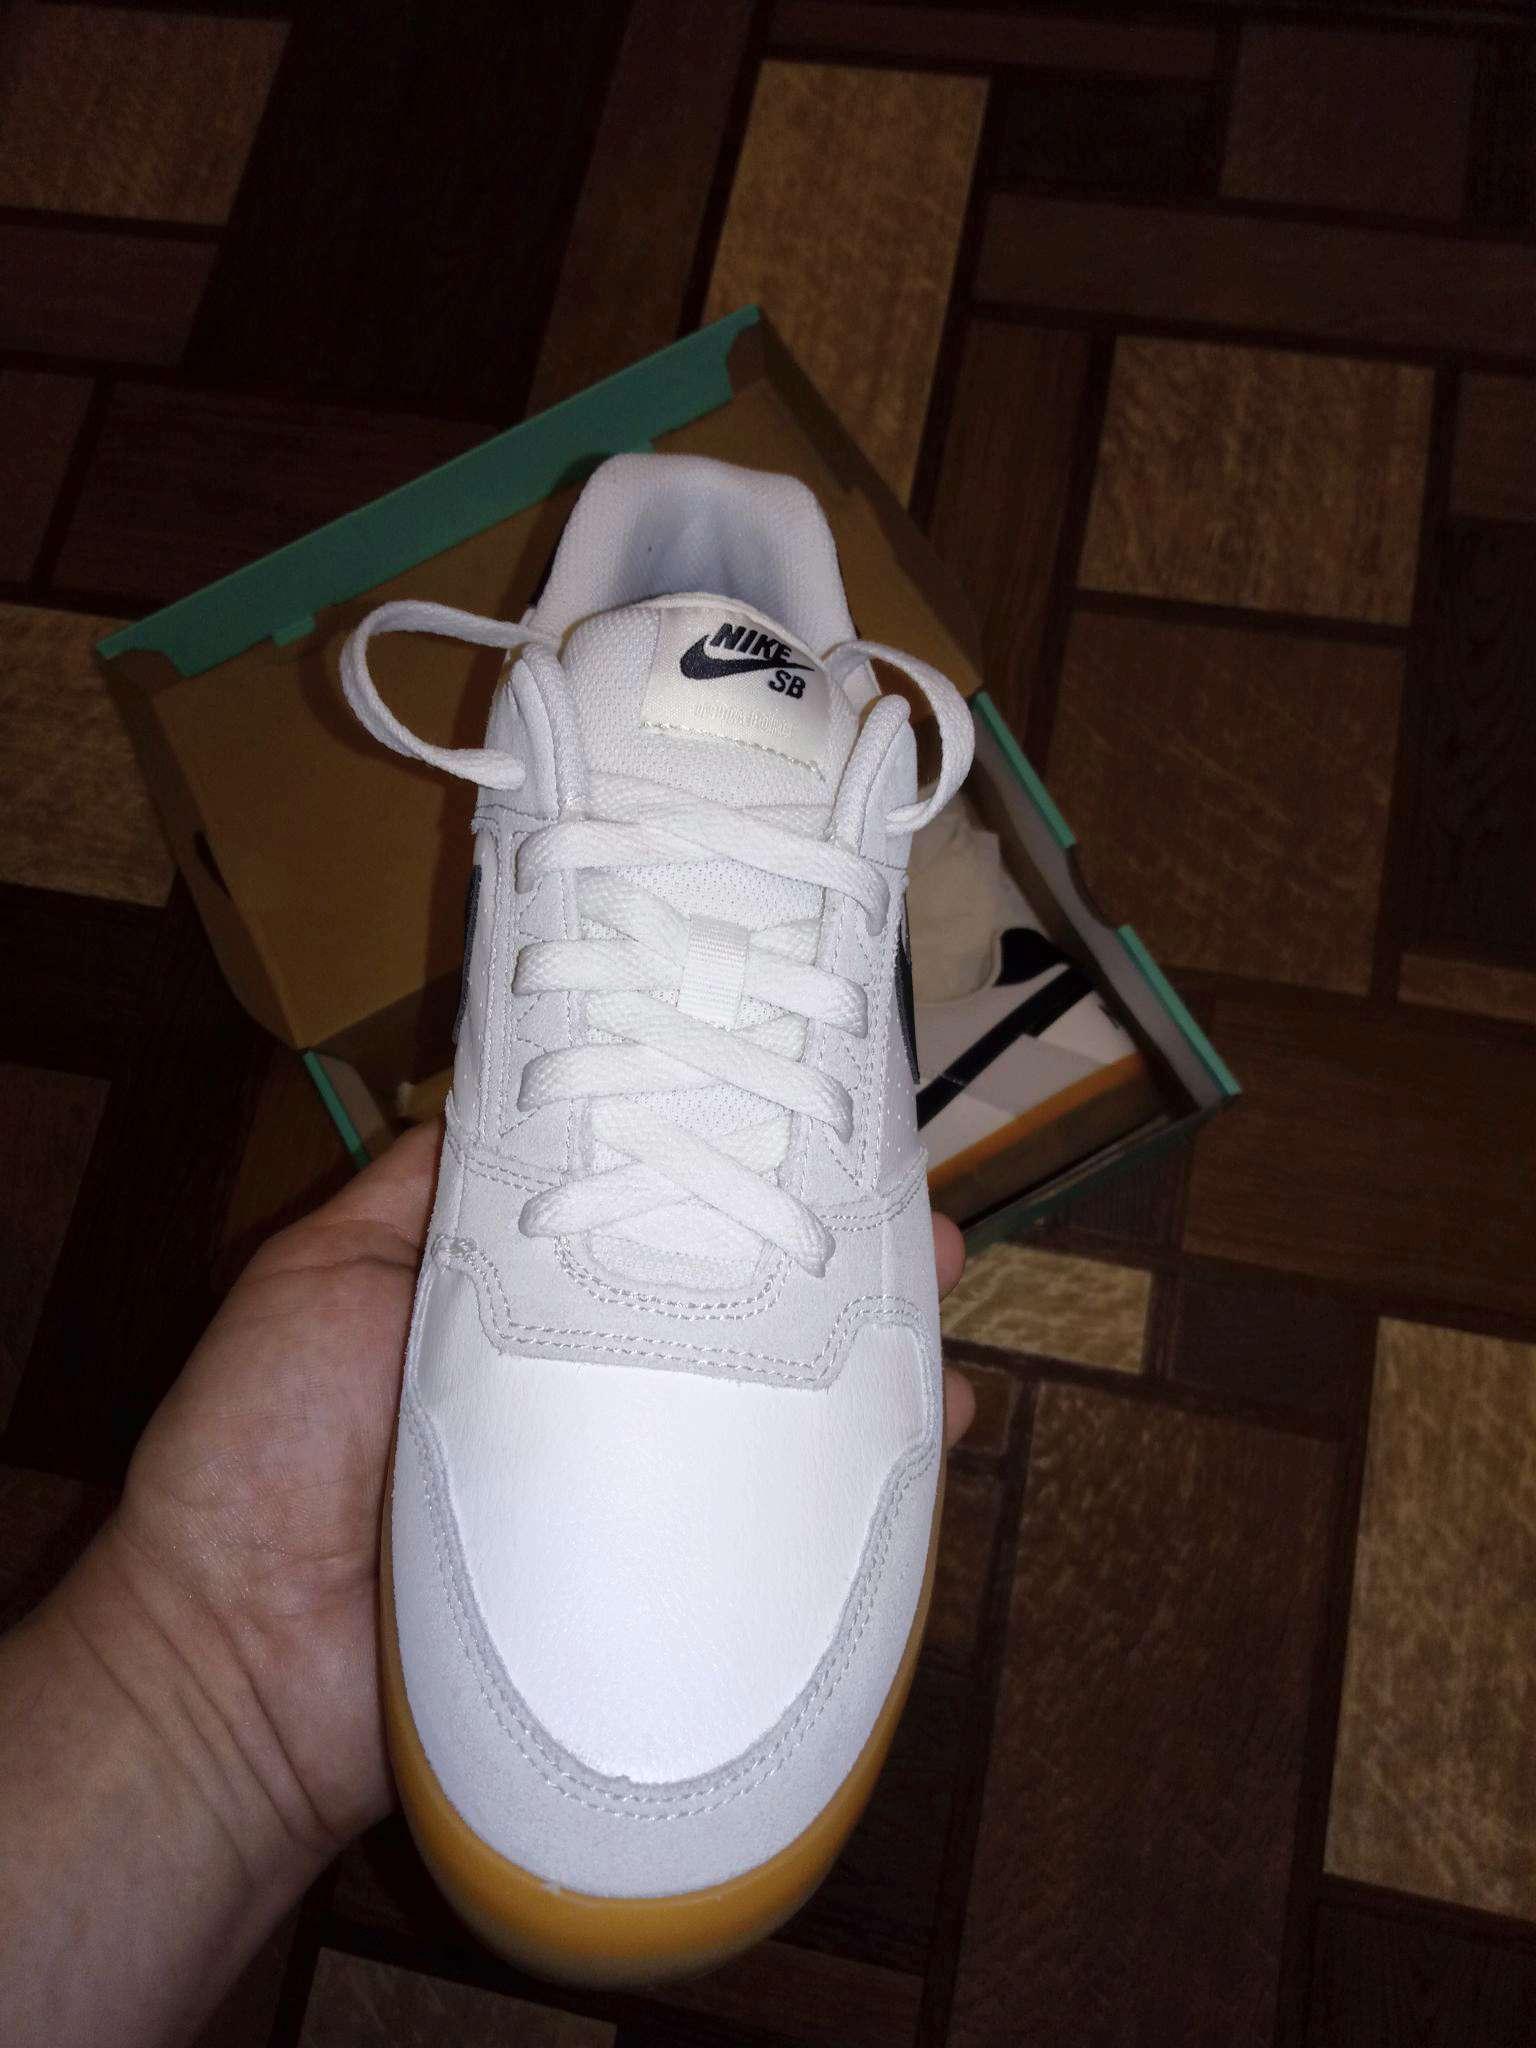 b0c43574660a Кеды NIKE 942237-101 SB Delta Force Vulc Skateboarding Shoe мужские ...